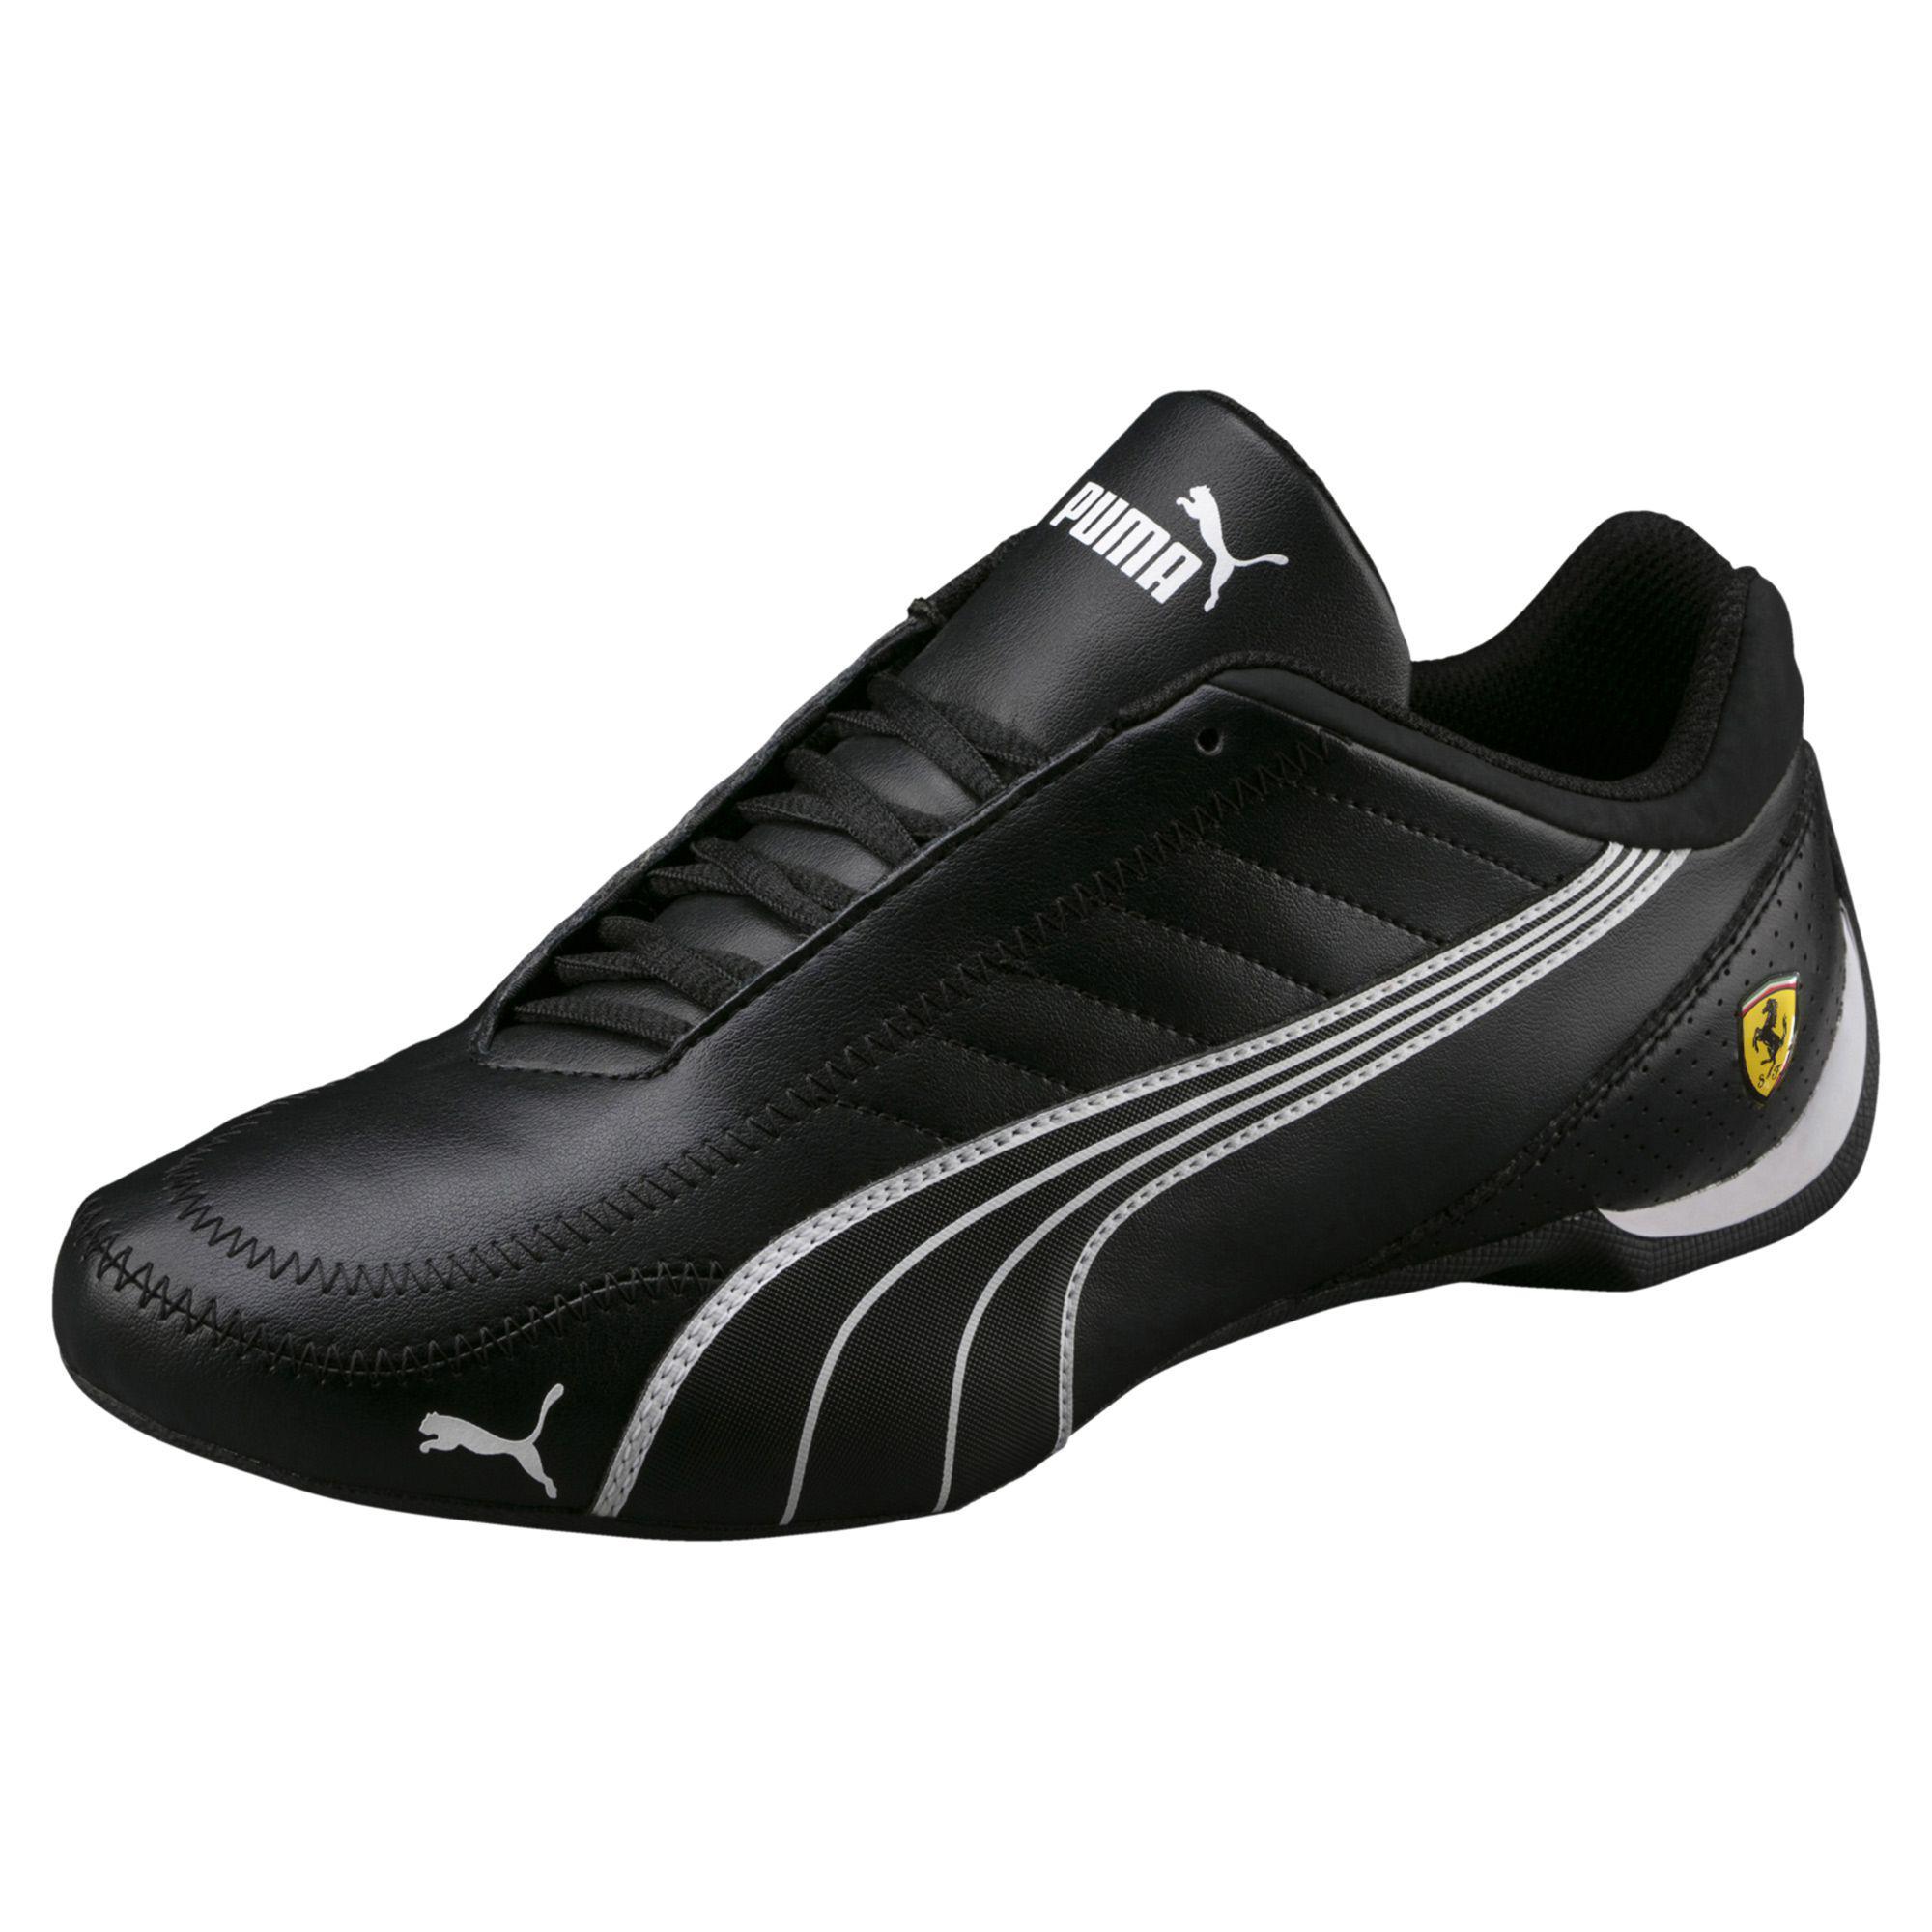 08999e8b455474 Lyst - PUMA Ferrari Future Cart Cat Men s Motorsport Shoes in Black ...